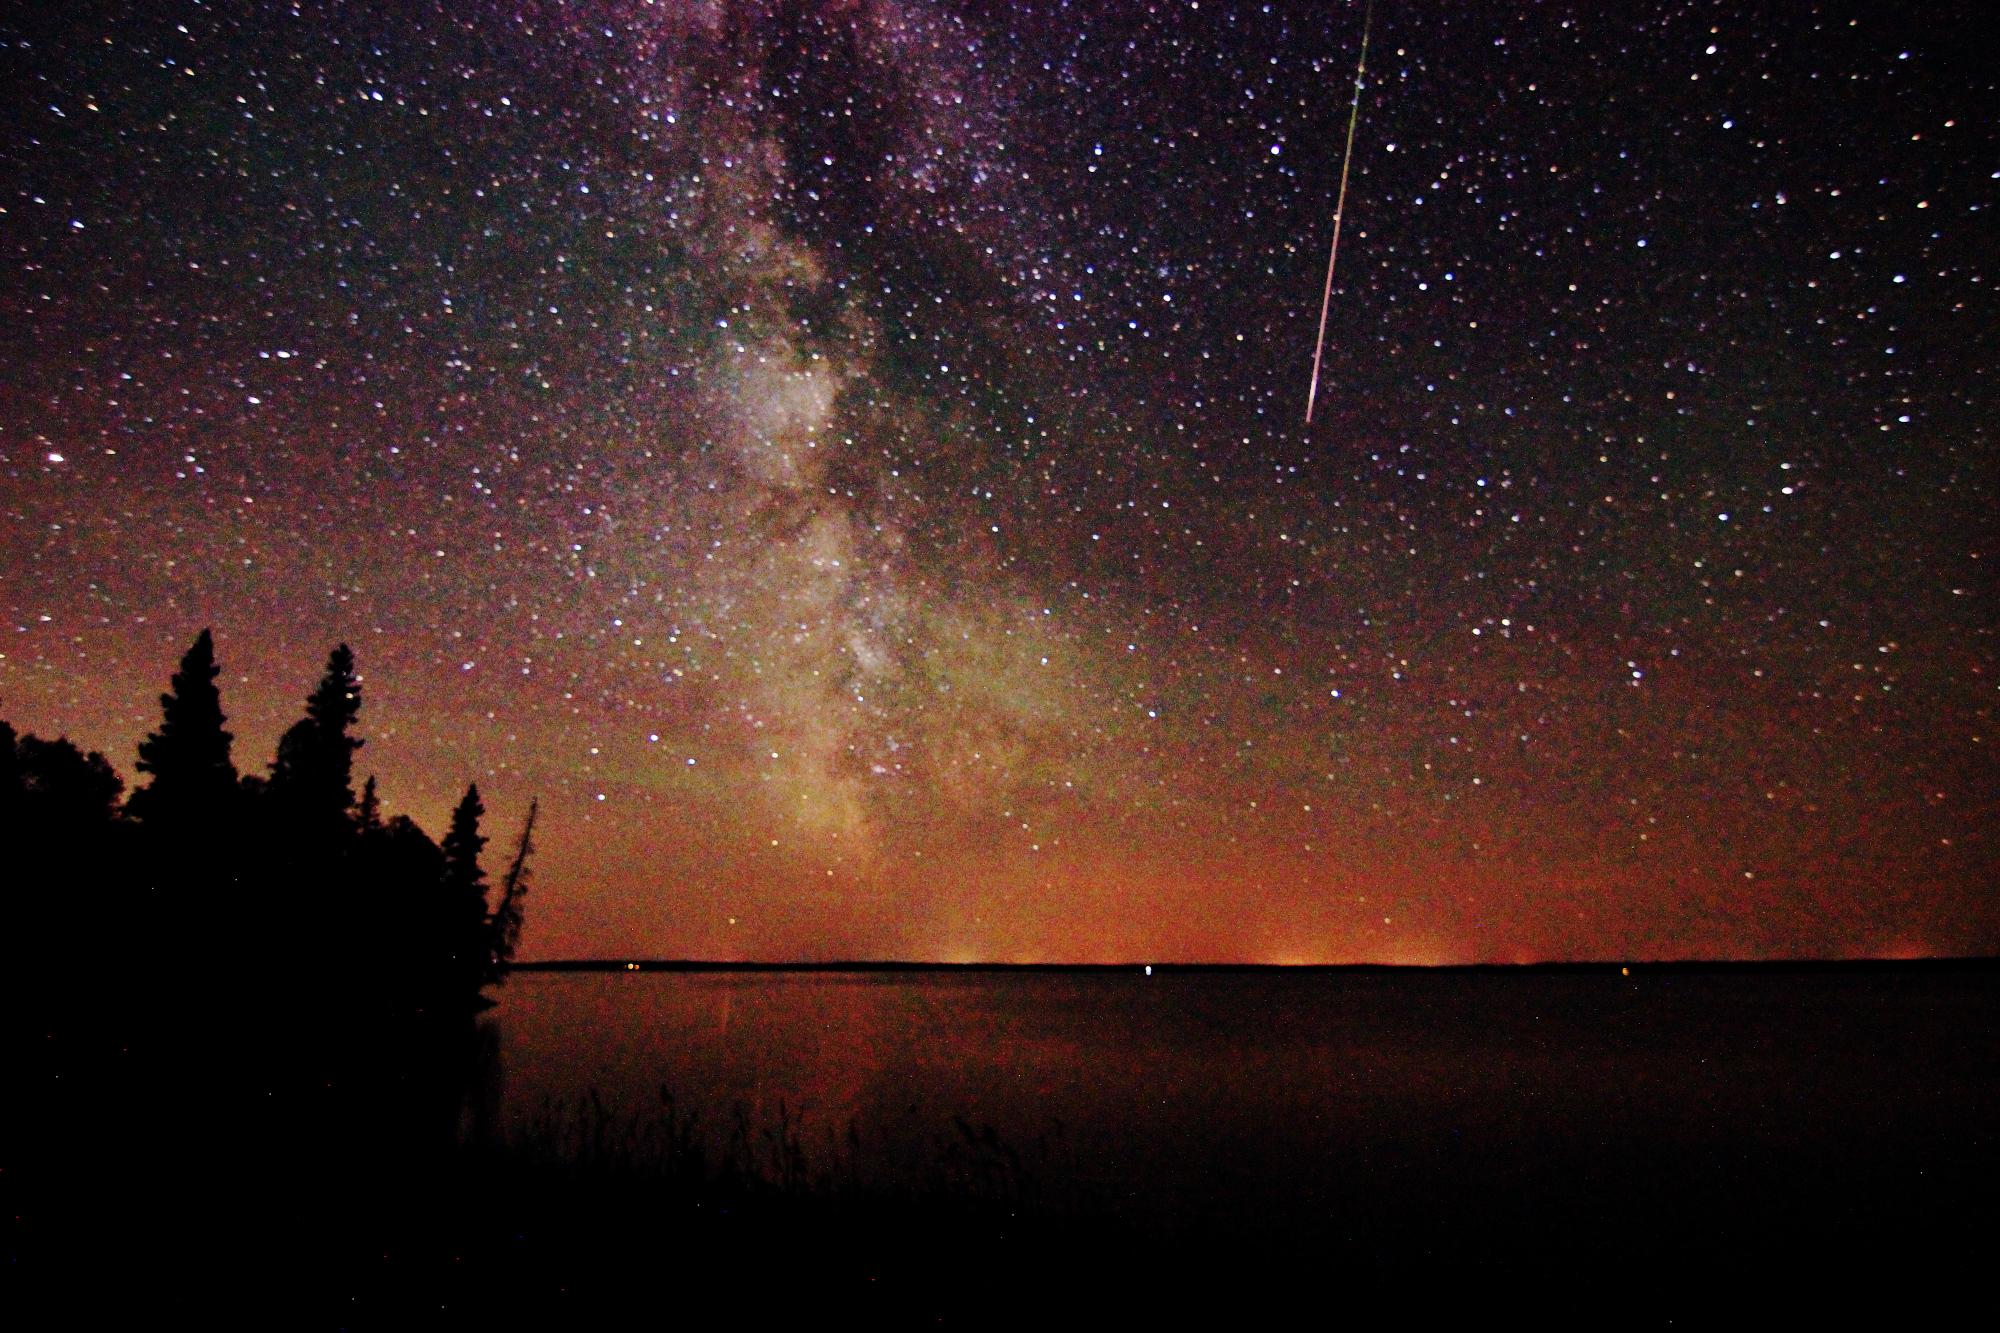 Milky Way and Perseid